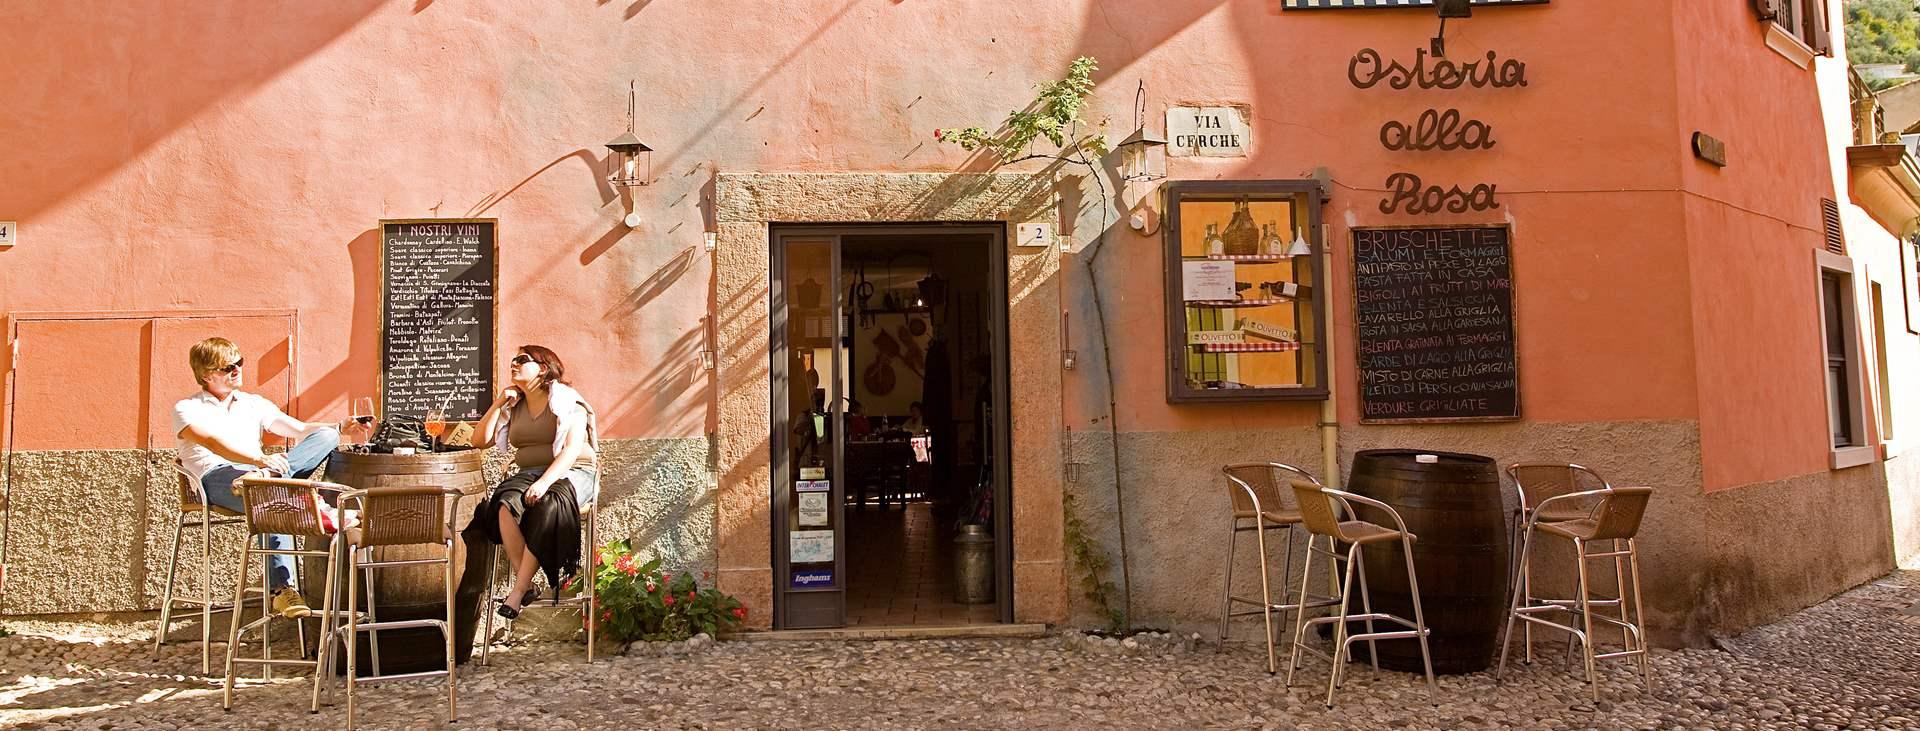 Lennot Verona